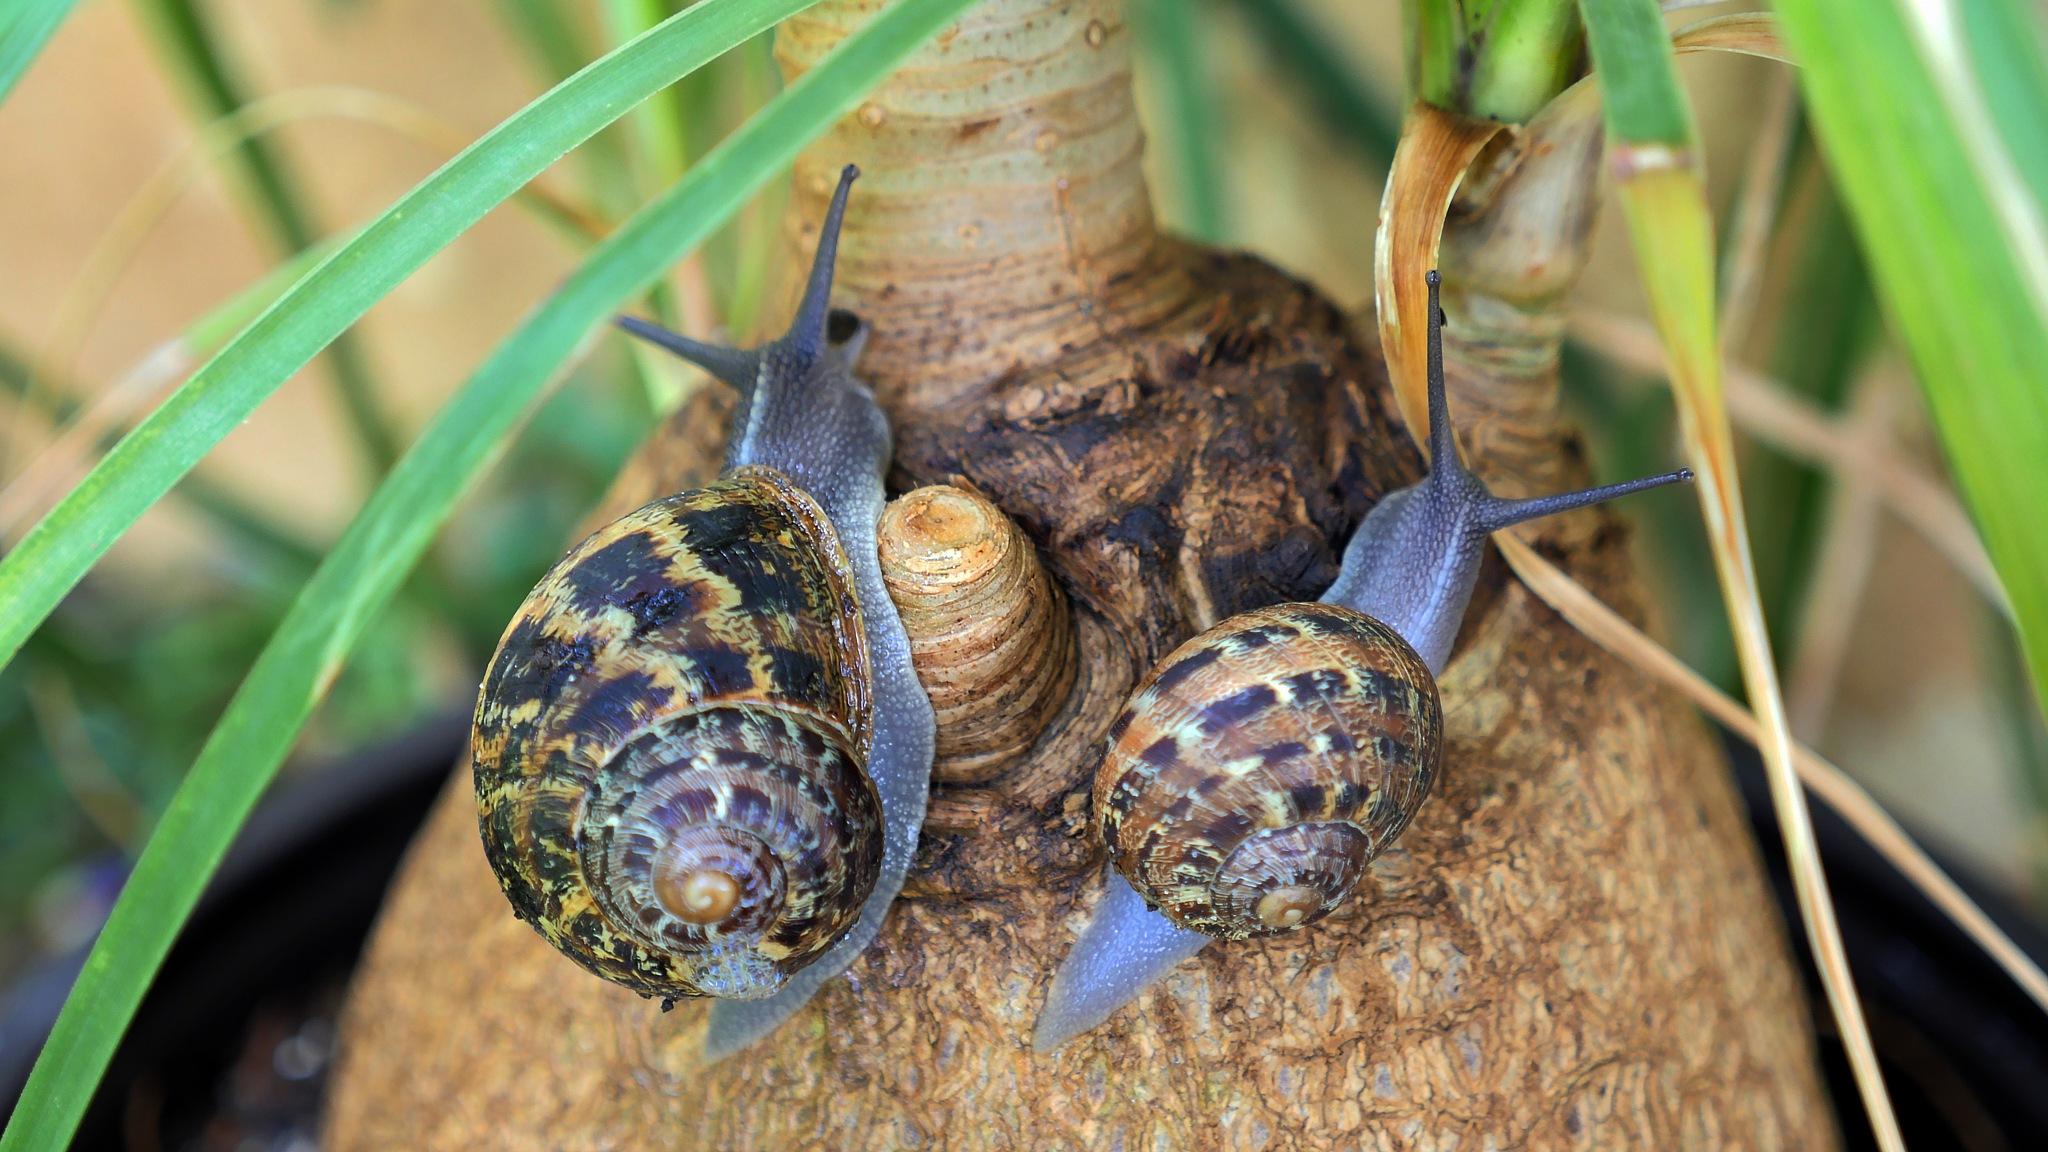 Snails by Moshe Harosh